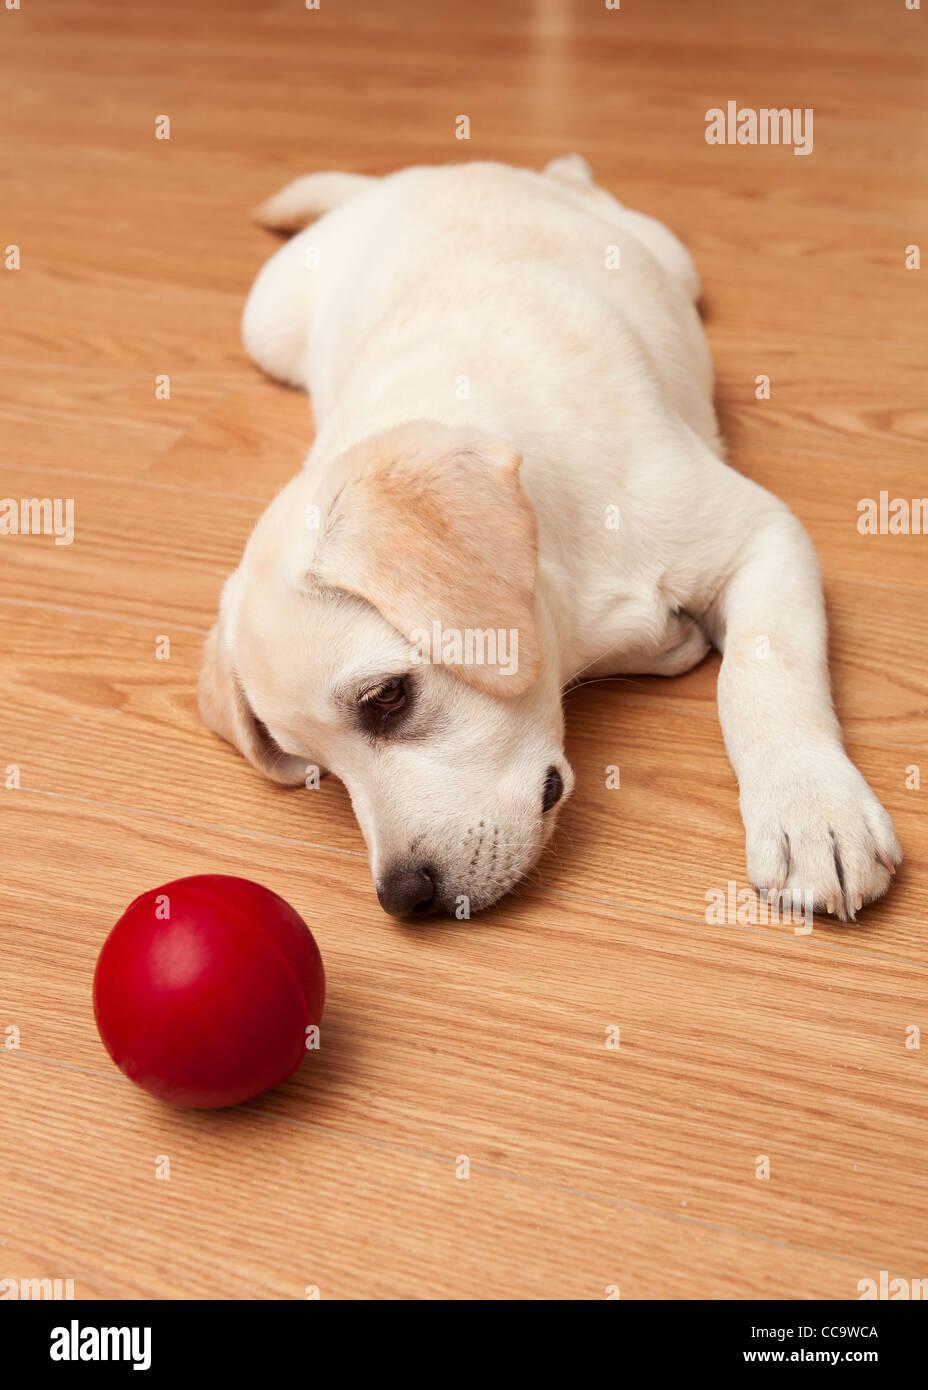 red labrador puppy stockfotos red labrador puppy bilder alamy. Black Bedroom Furniture Sets. Home Design Ideas